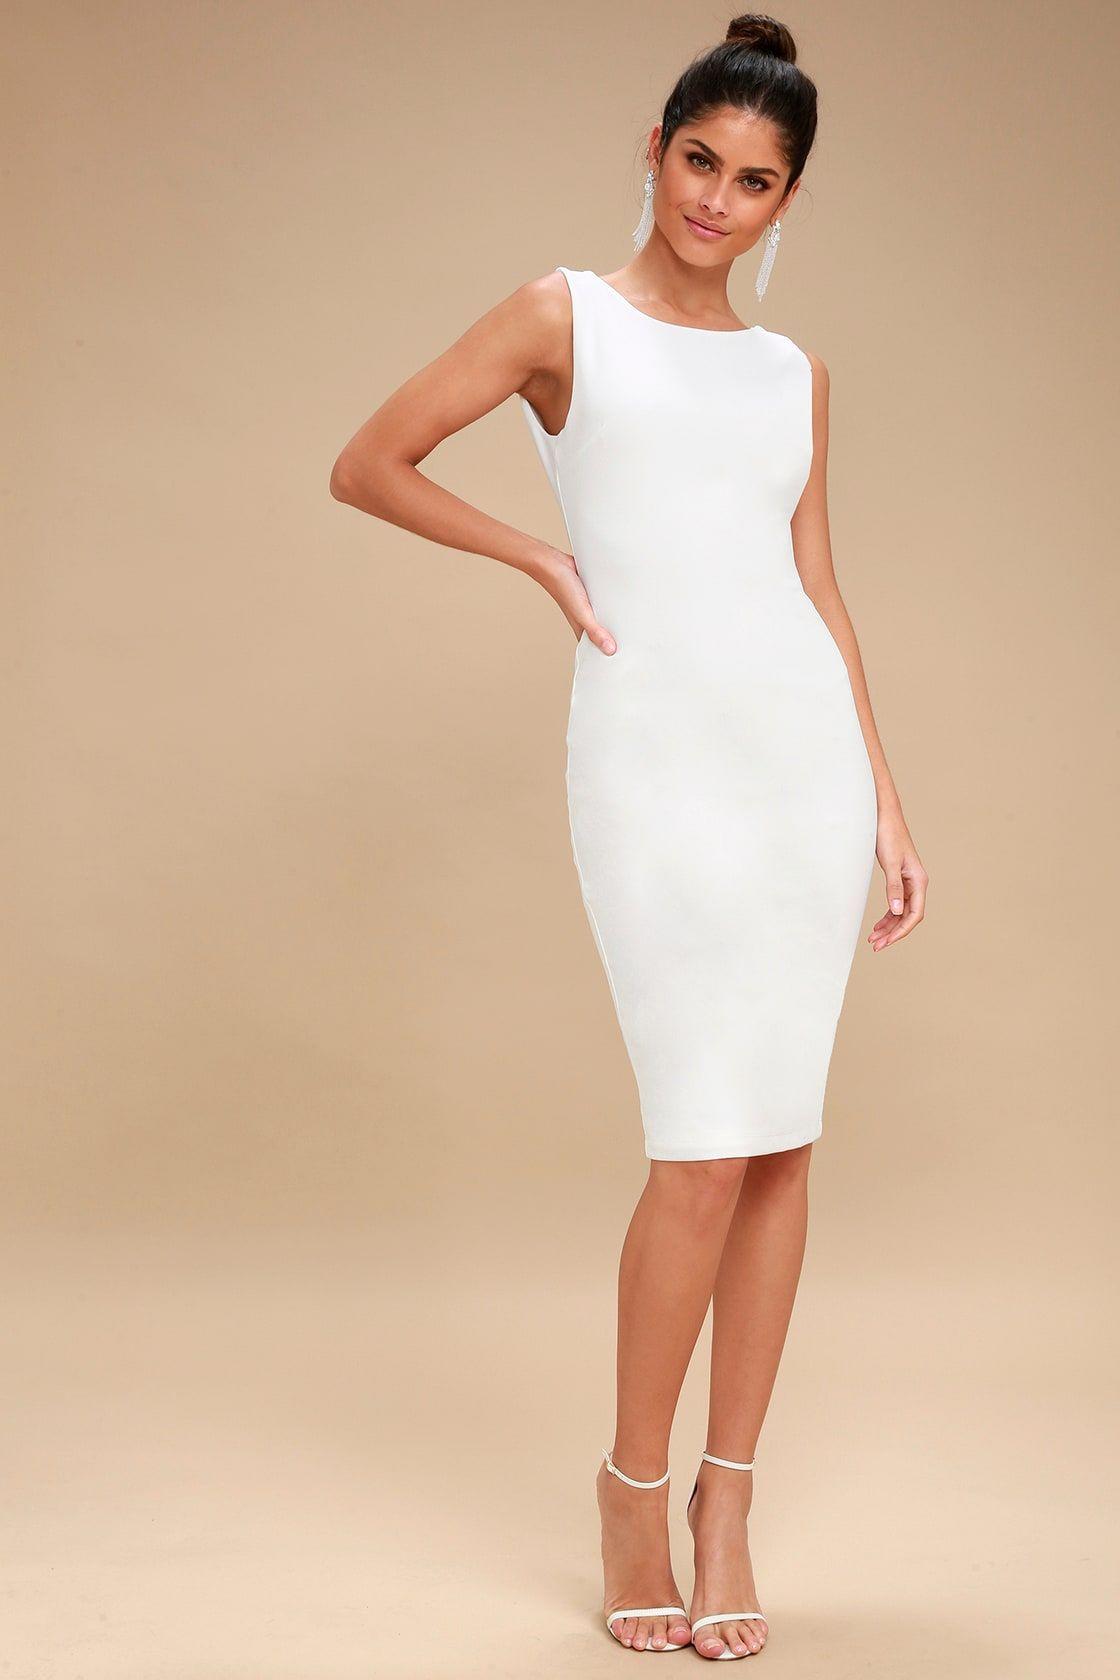 So Stunning White Backless Midi Dress Vestidos De Fiesta Vestidos Cortos Boda Vestidos Blancos [ 1680 x 1120 Pixel ]